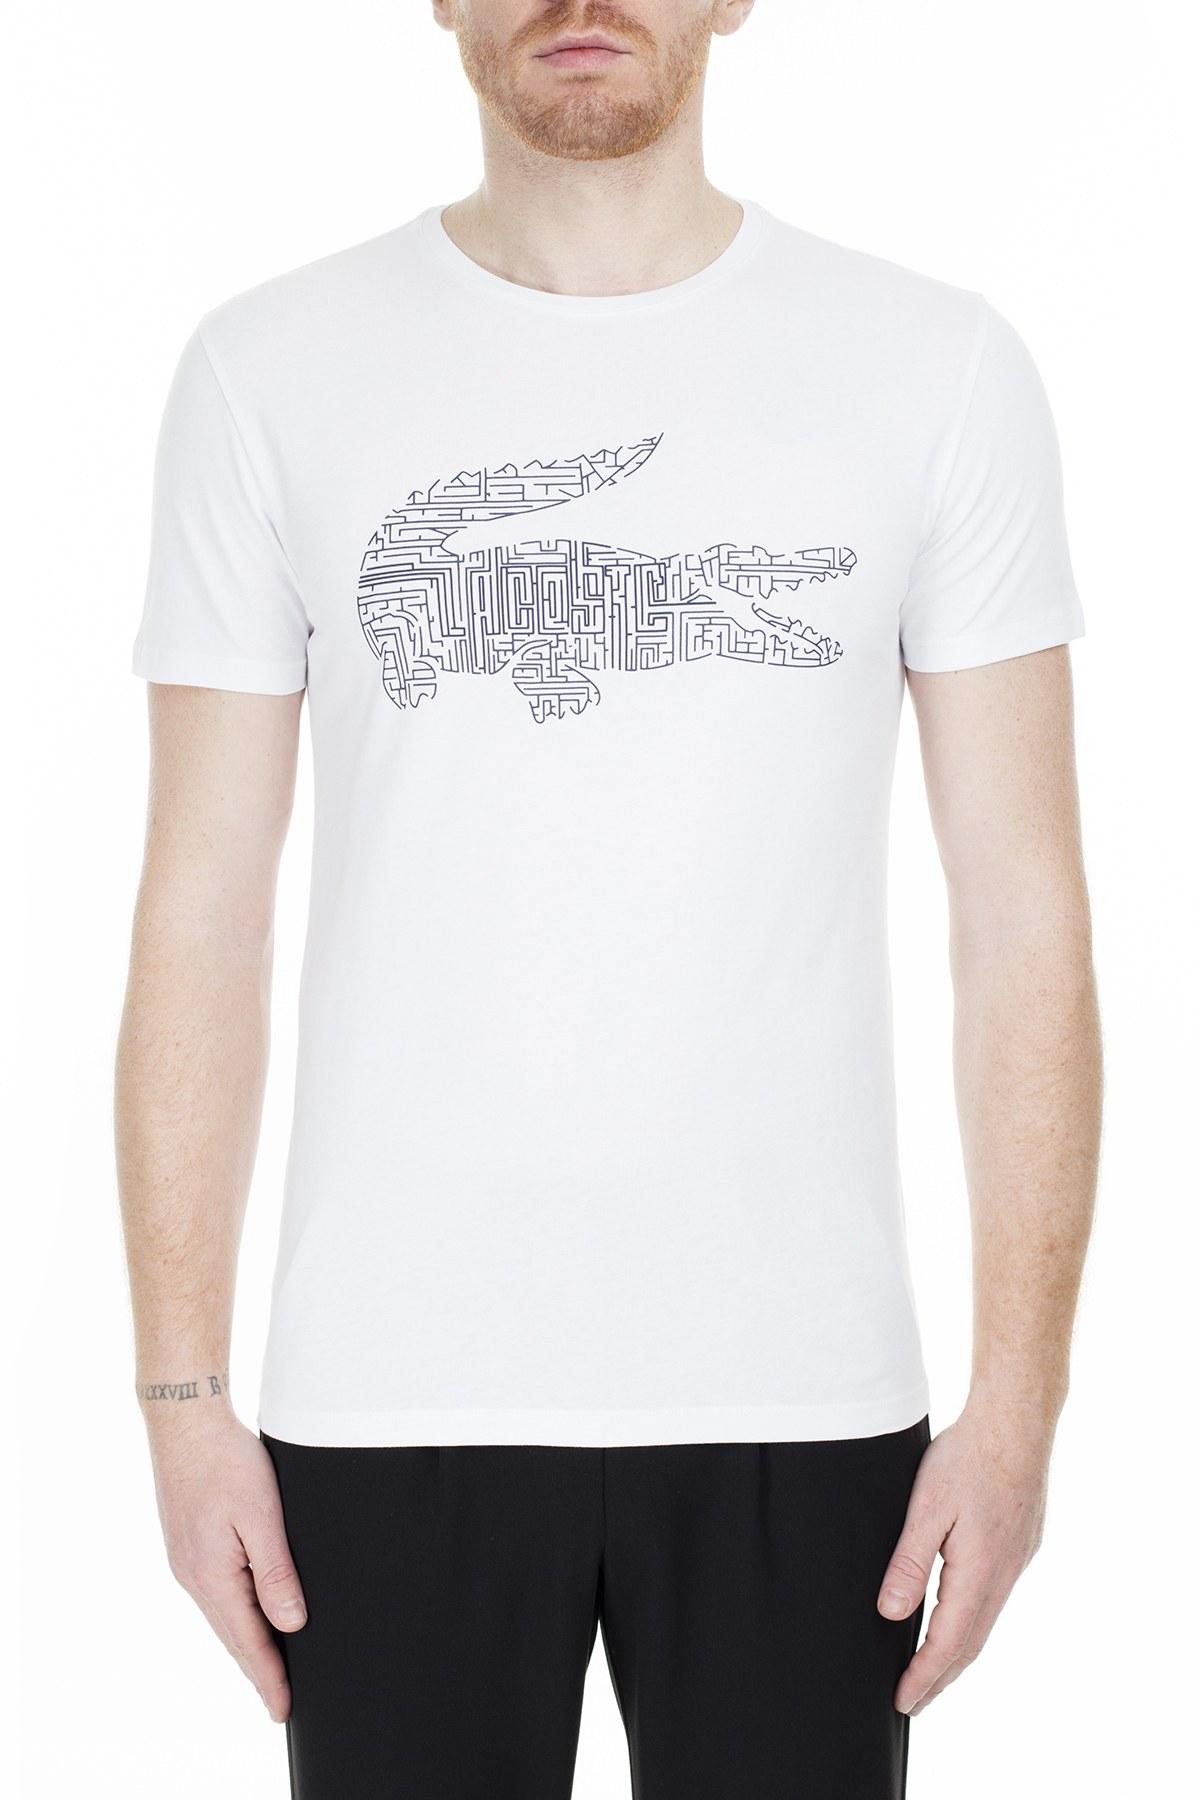 Lacoste Baskılı Bisiklet Yaka Erkek T Shirt TH0027 27A BEYAZ